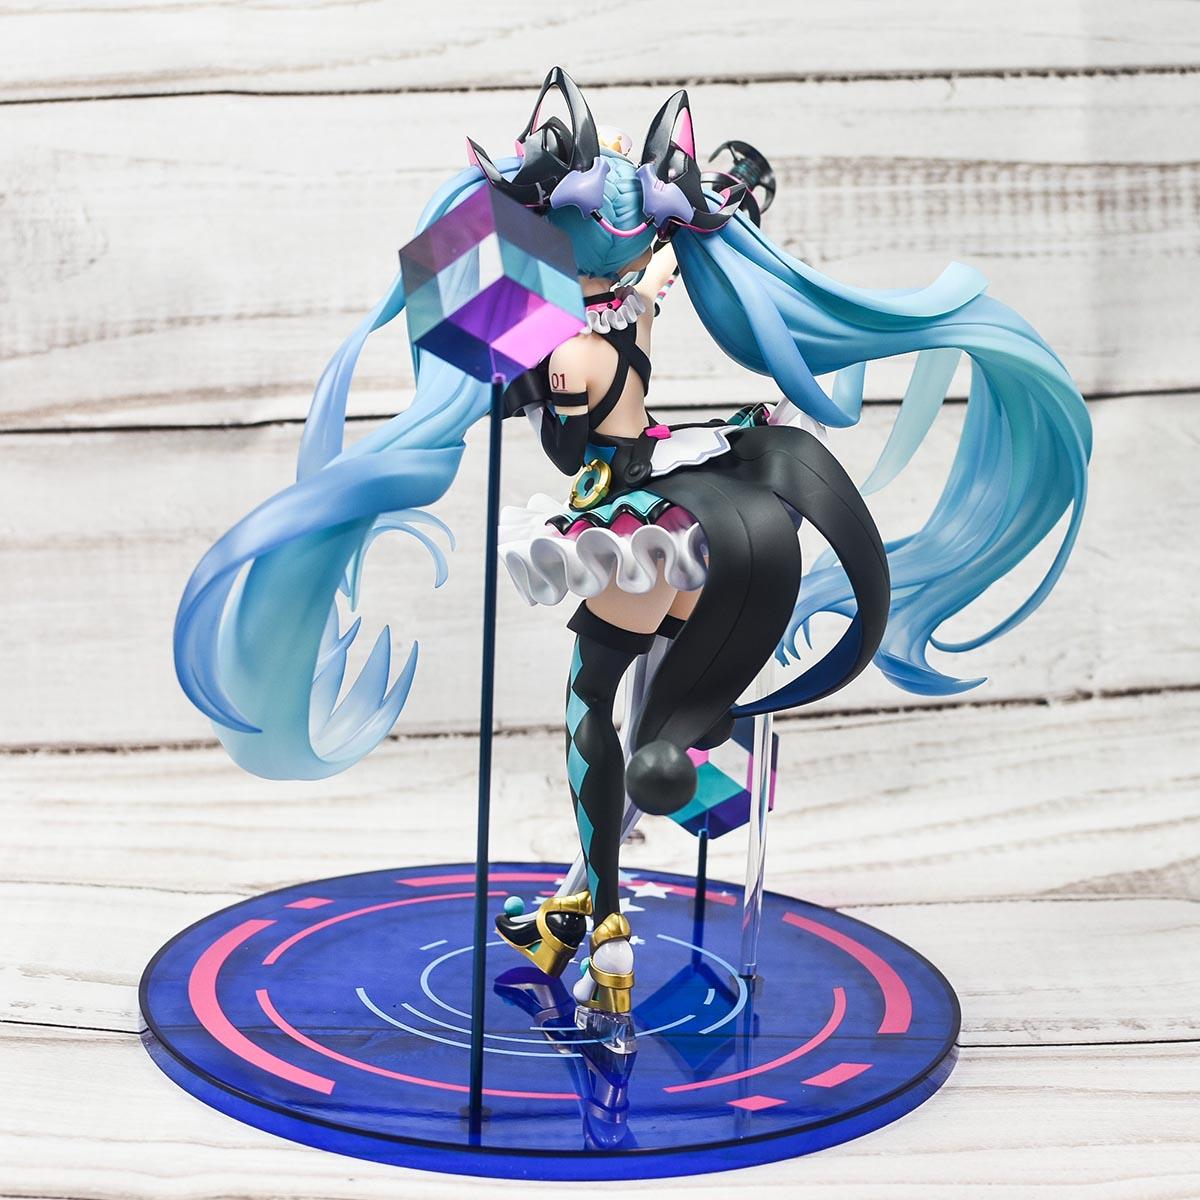 F:NEX 初音ミク「マジカルミライ 2019」Ver. フィギュアレビュー7